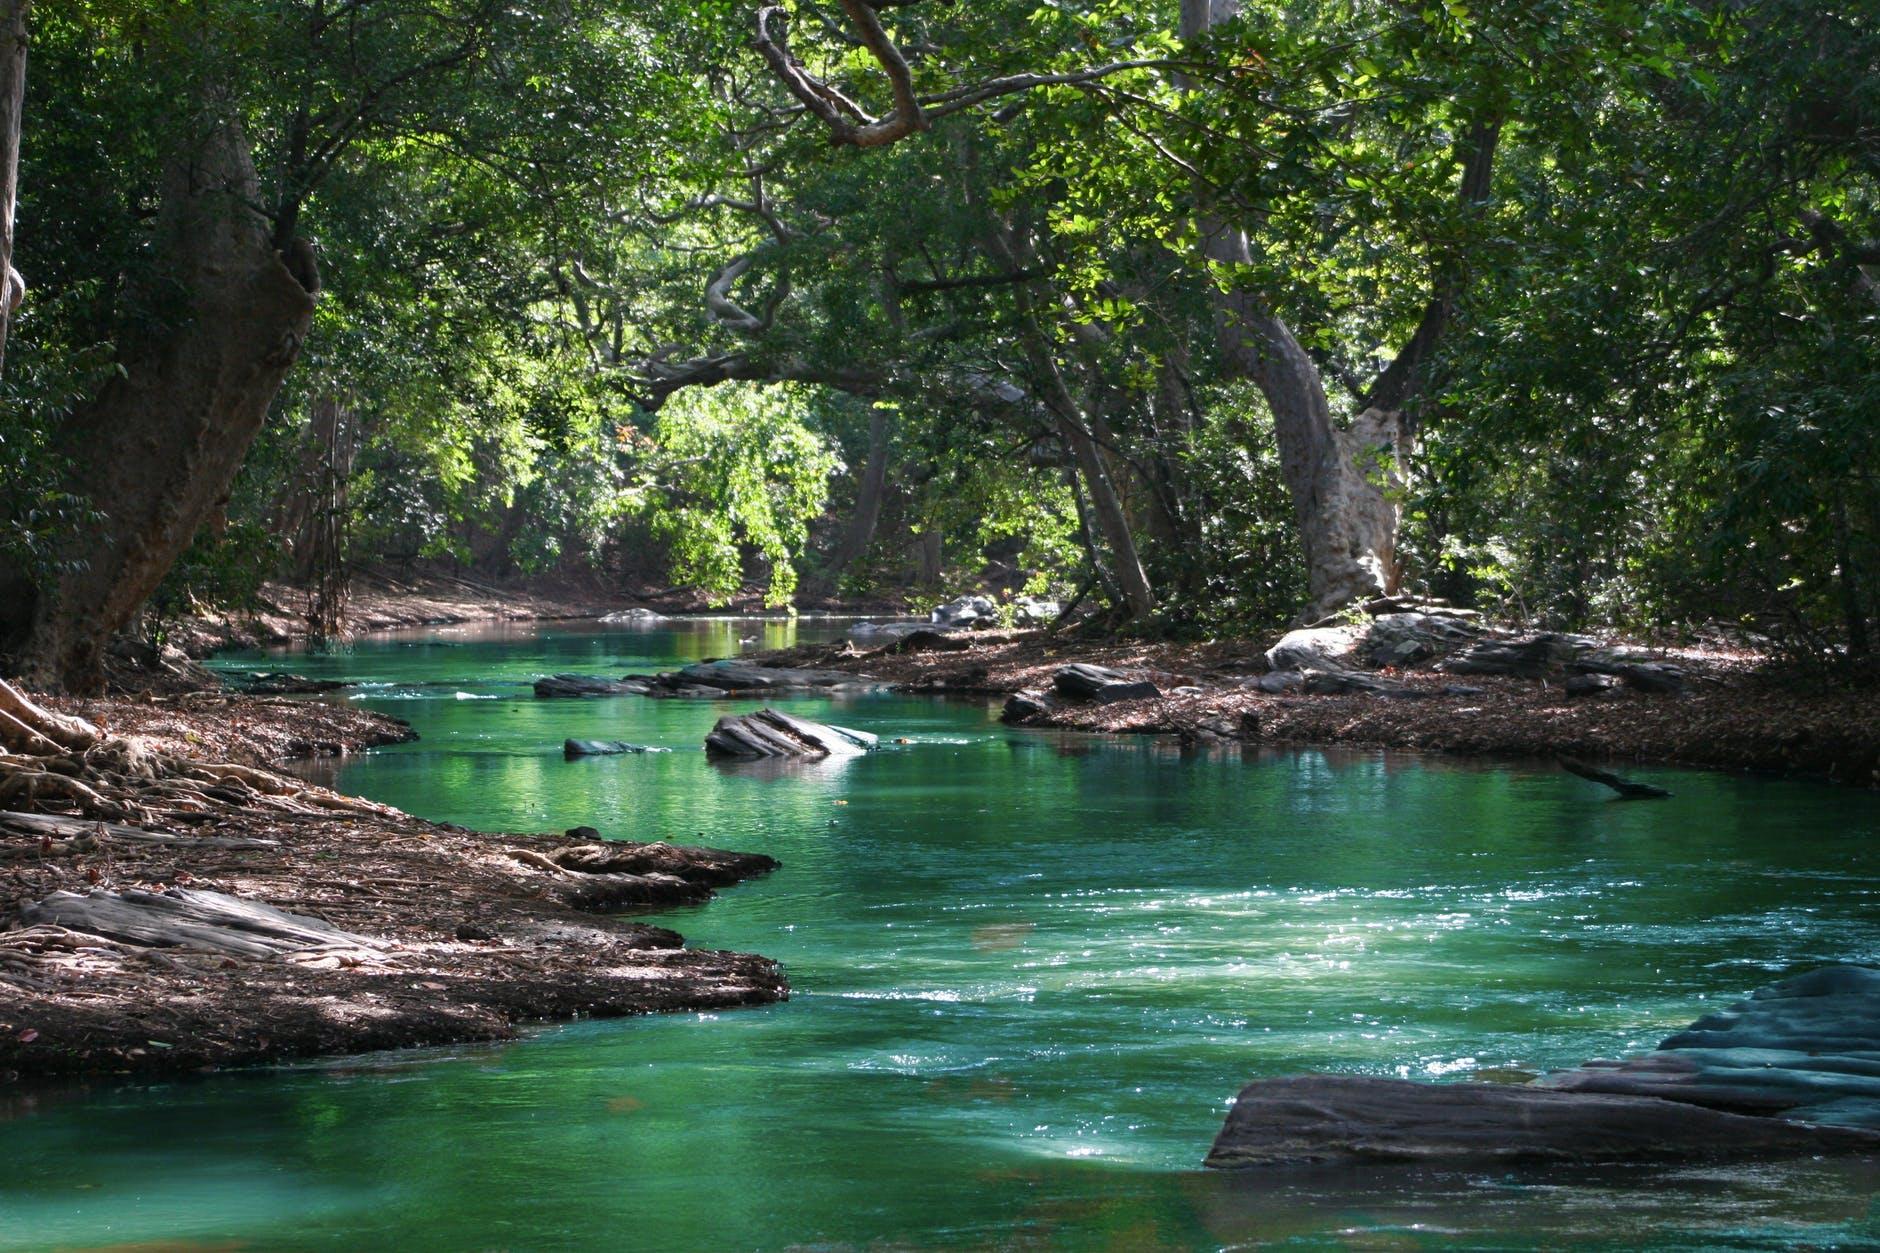 body of water between green leaf trees